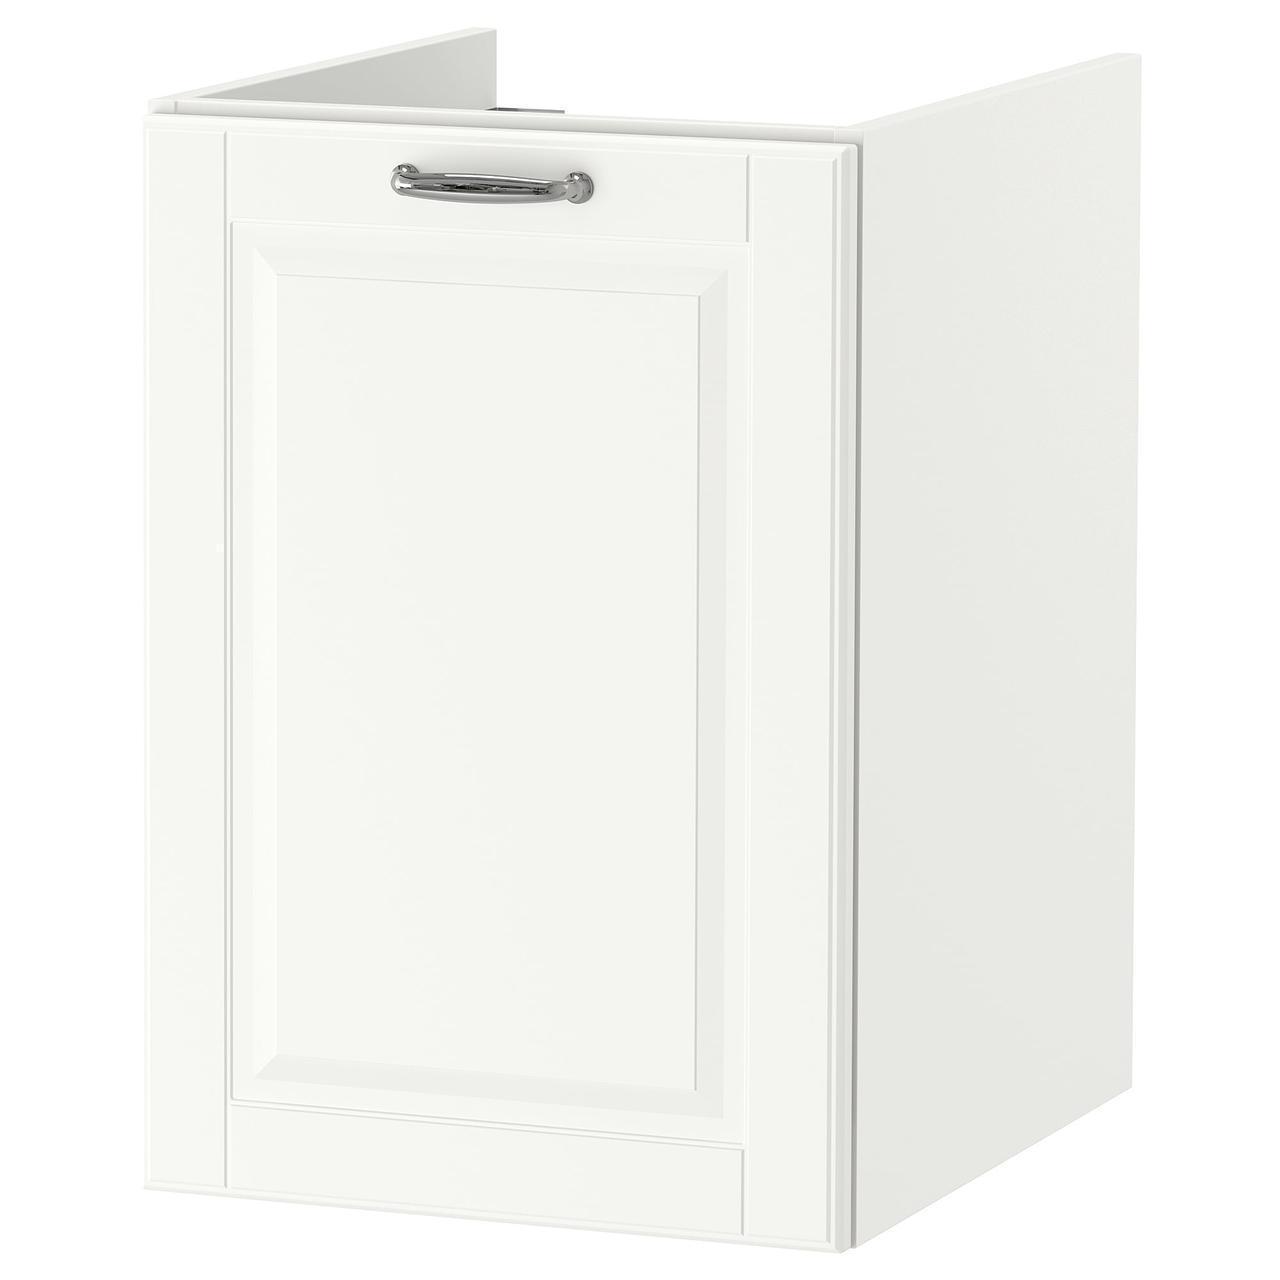 IKEA GODMORGON Шкаф для корзины для белья, Касжöн белый  (203.922.62)